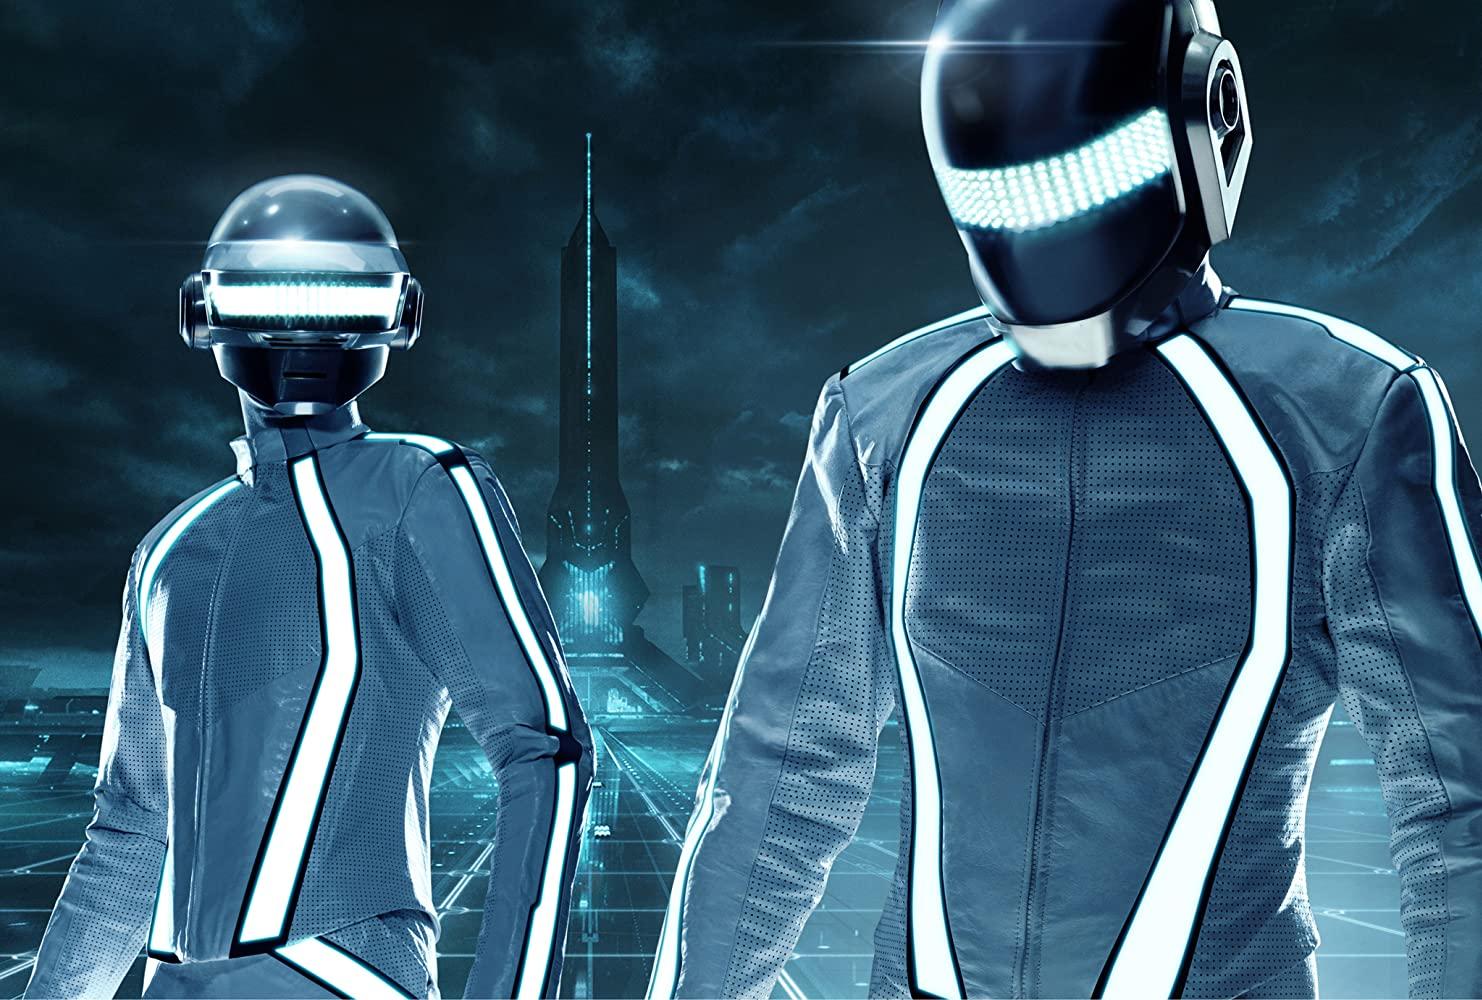 Daft Punk in Tron (2010)